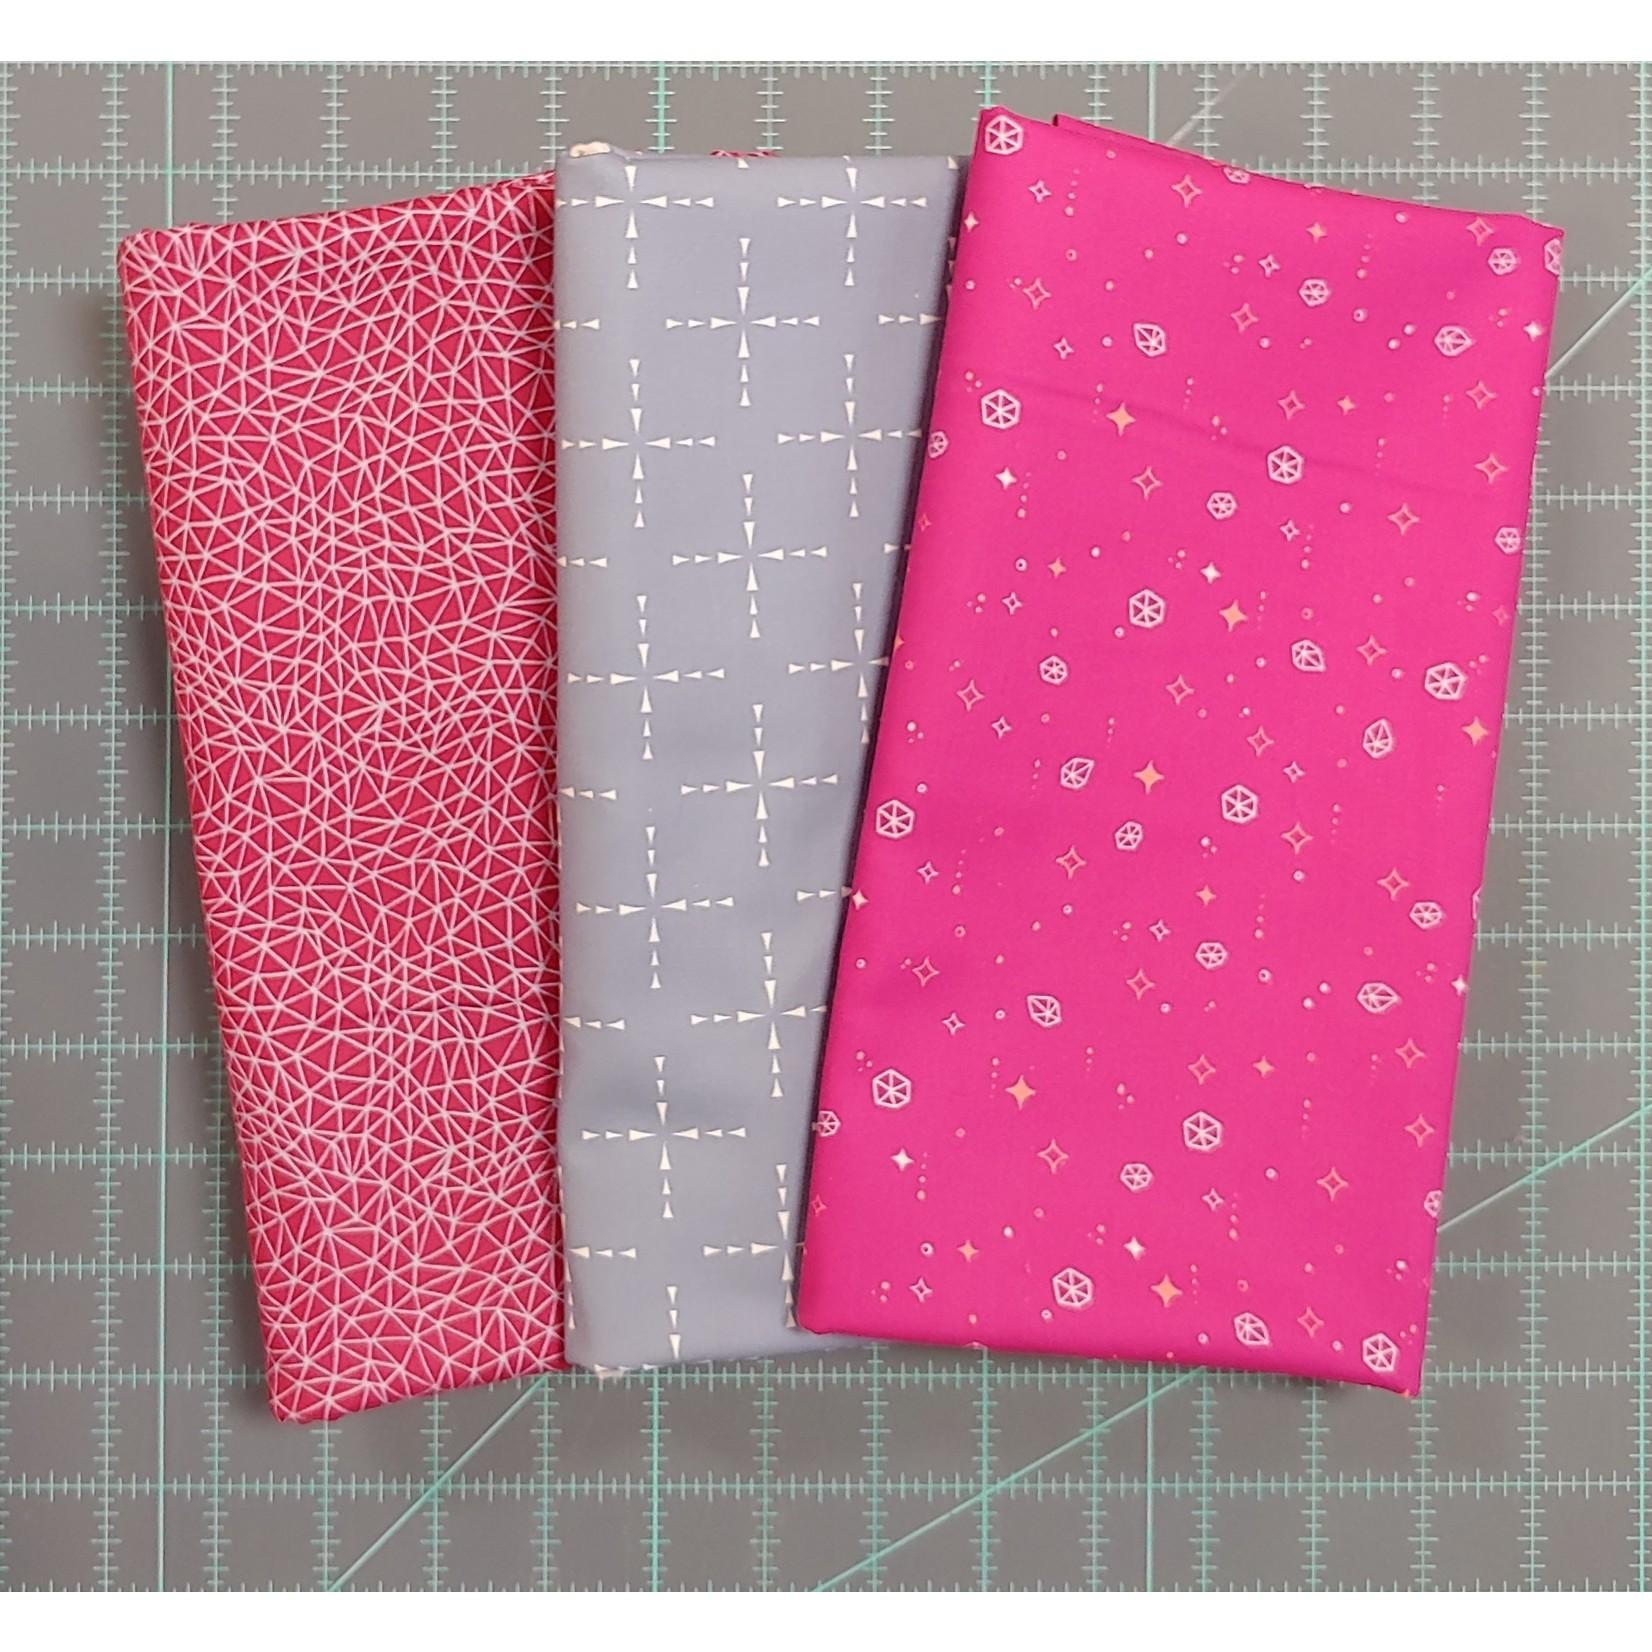 Maywood Moongate Bundle - Pink